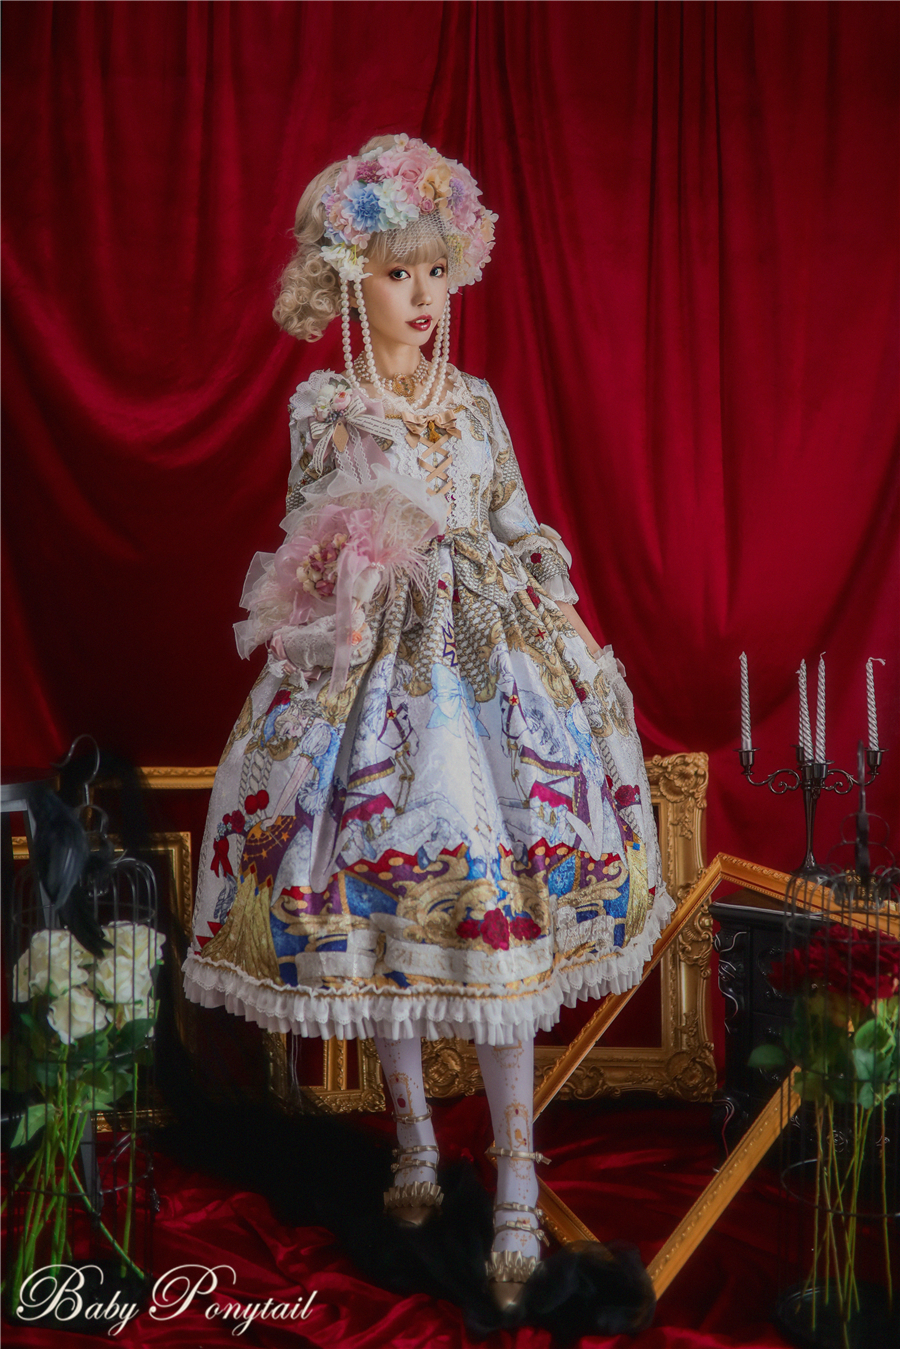 Baby Ponytail_Circus Princess_Silver OP_Kaka_05.jpg